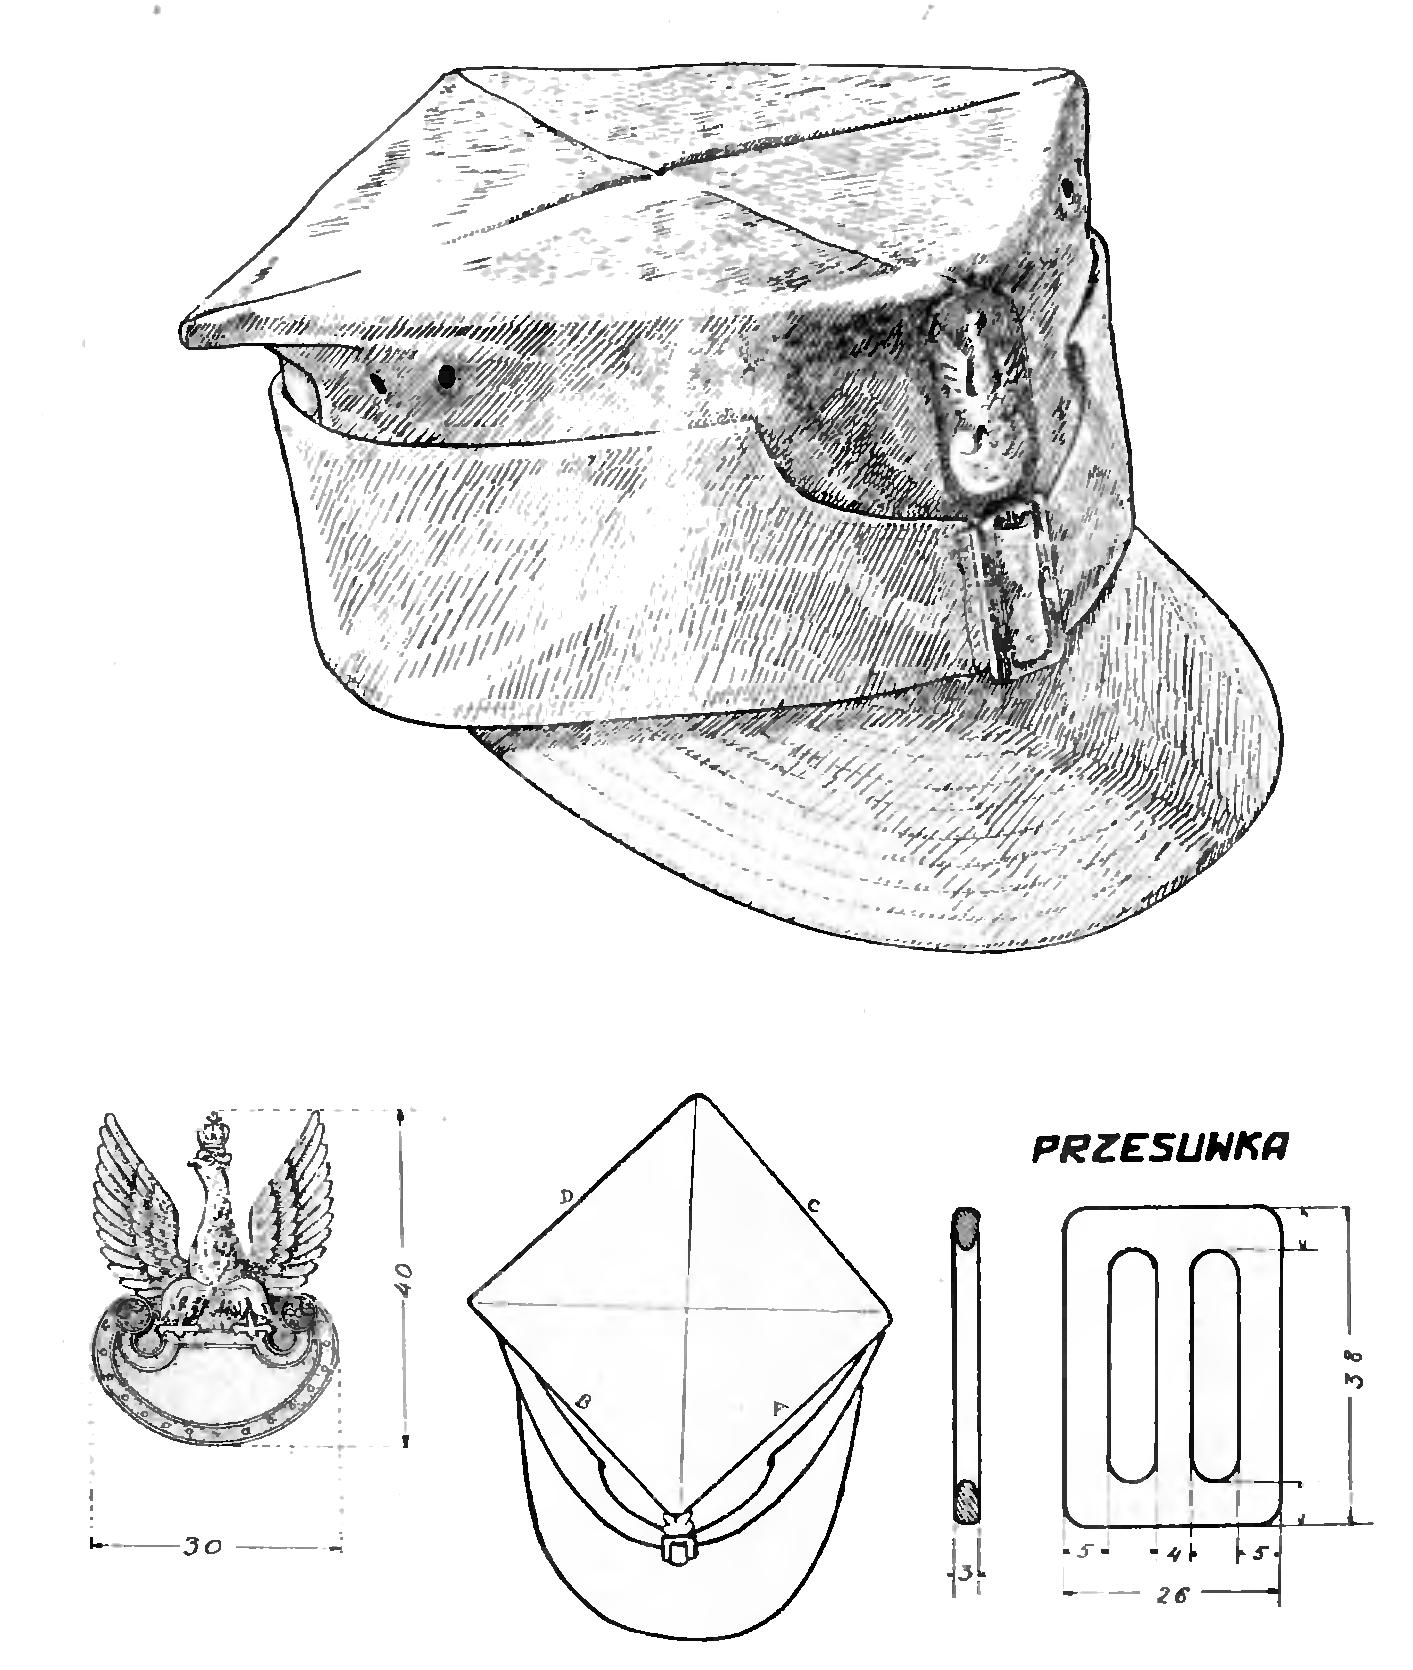 Rogatywka_wz_1937_konstrukcja.png